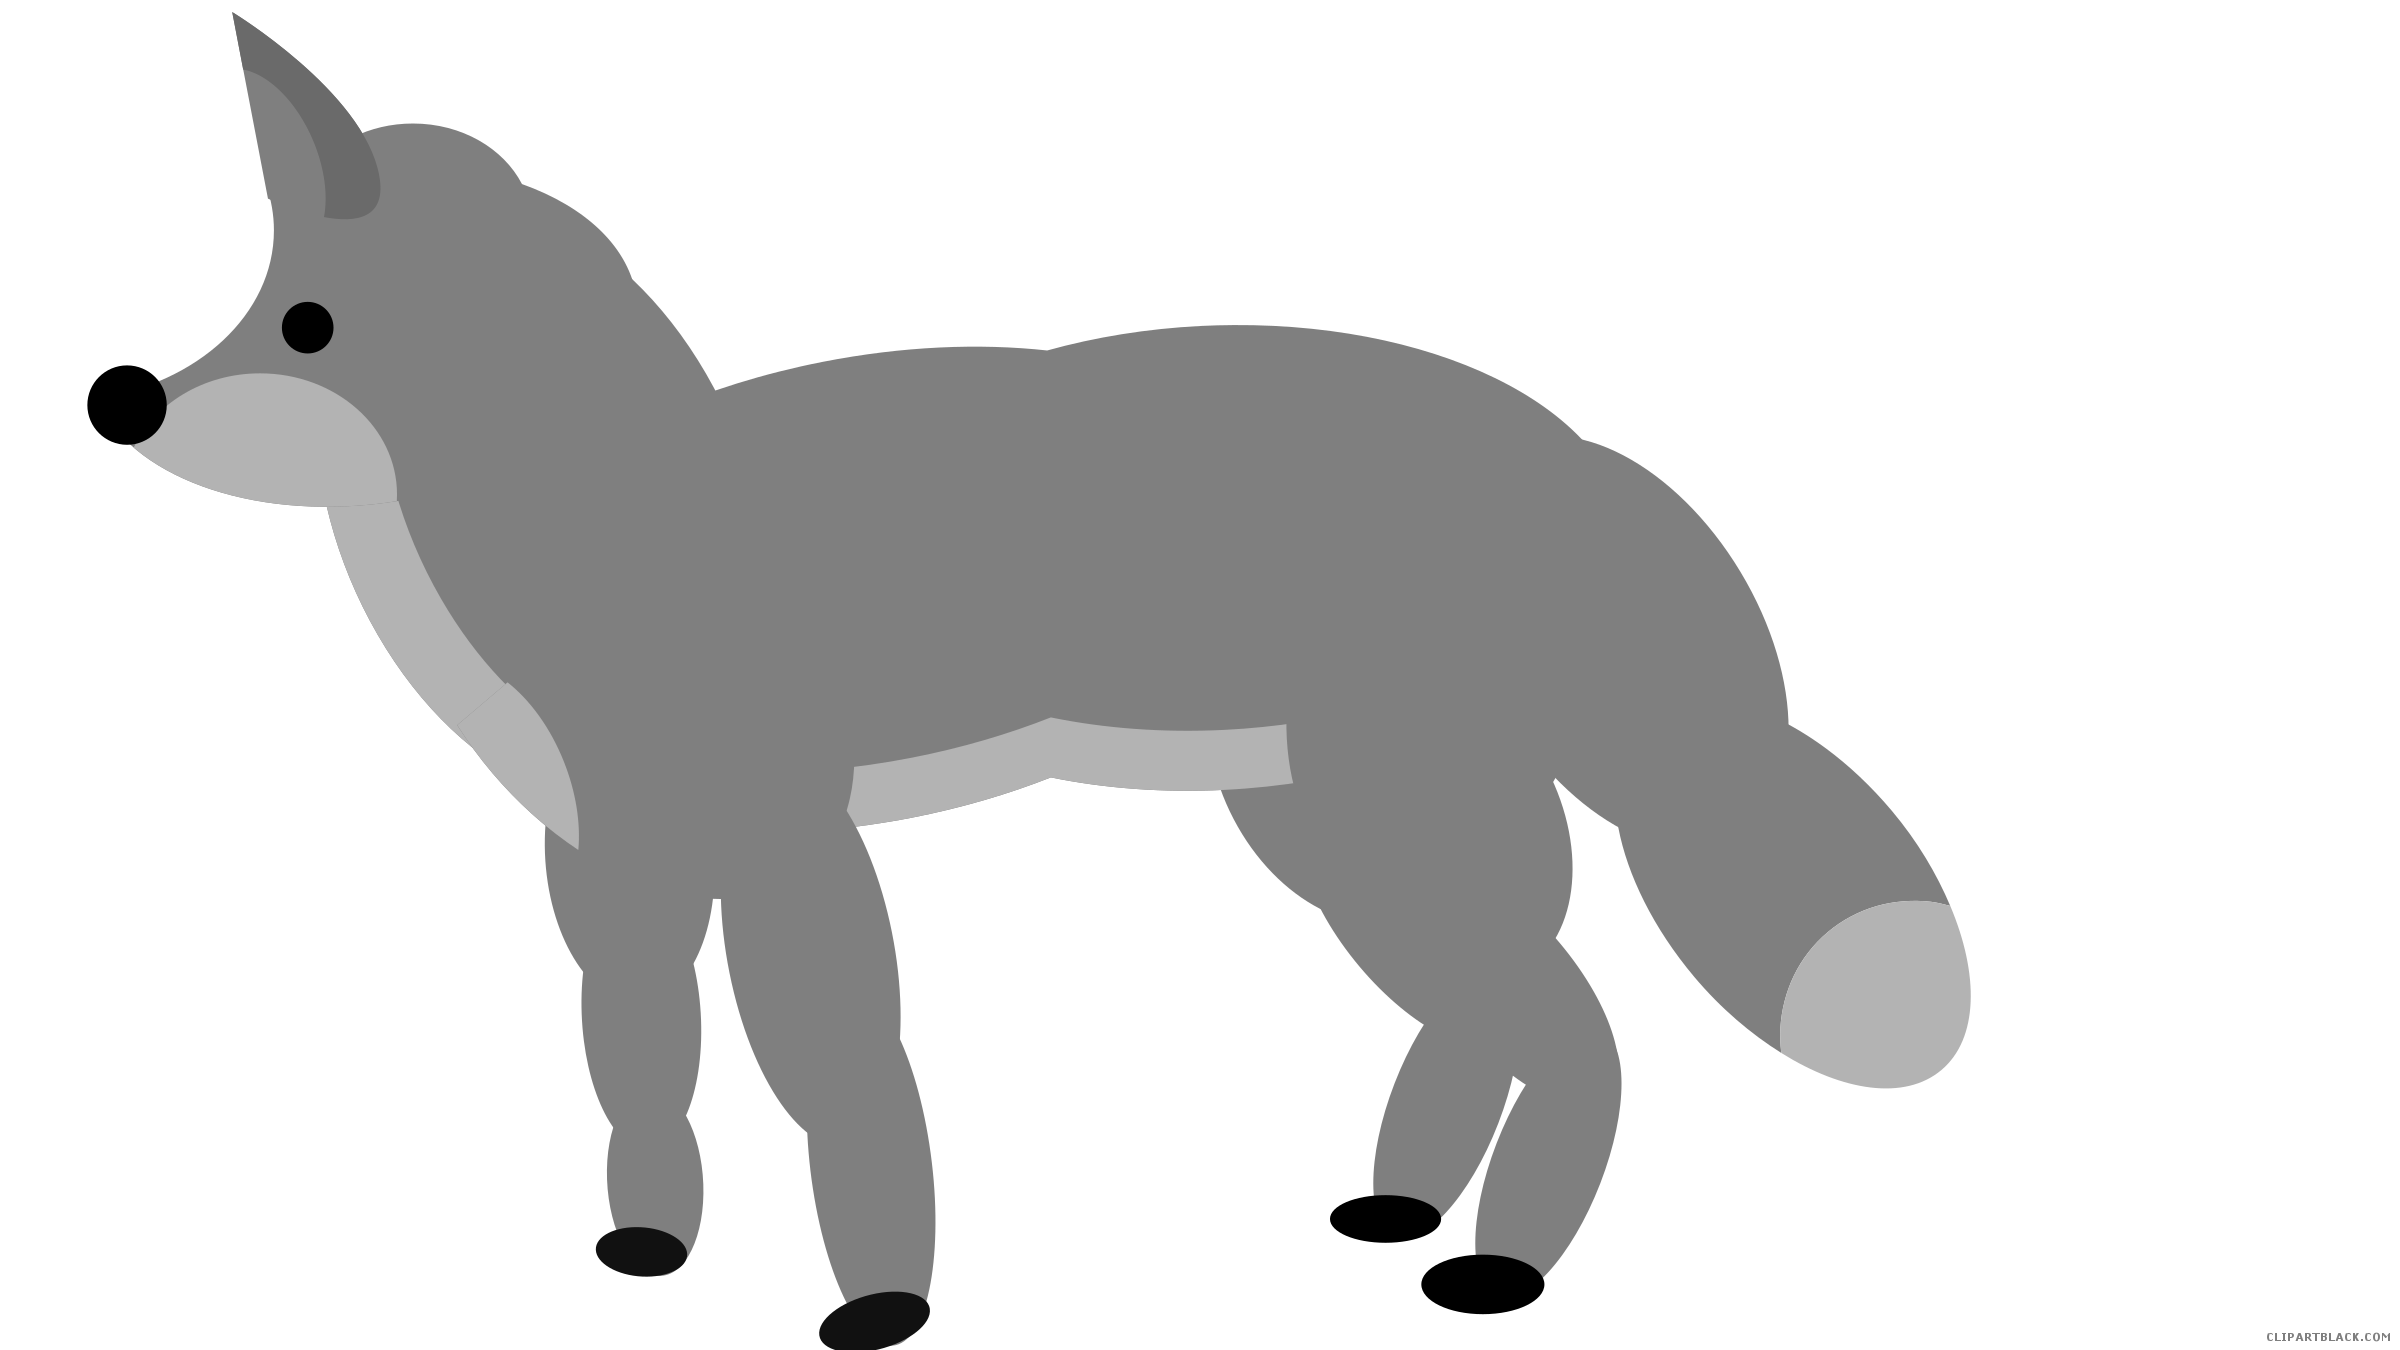 Standing clipartblack com animal. Fox clipart gray fox